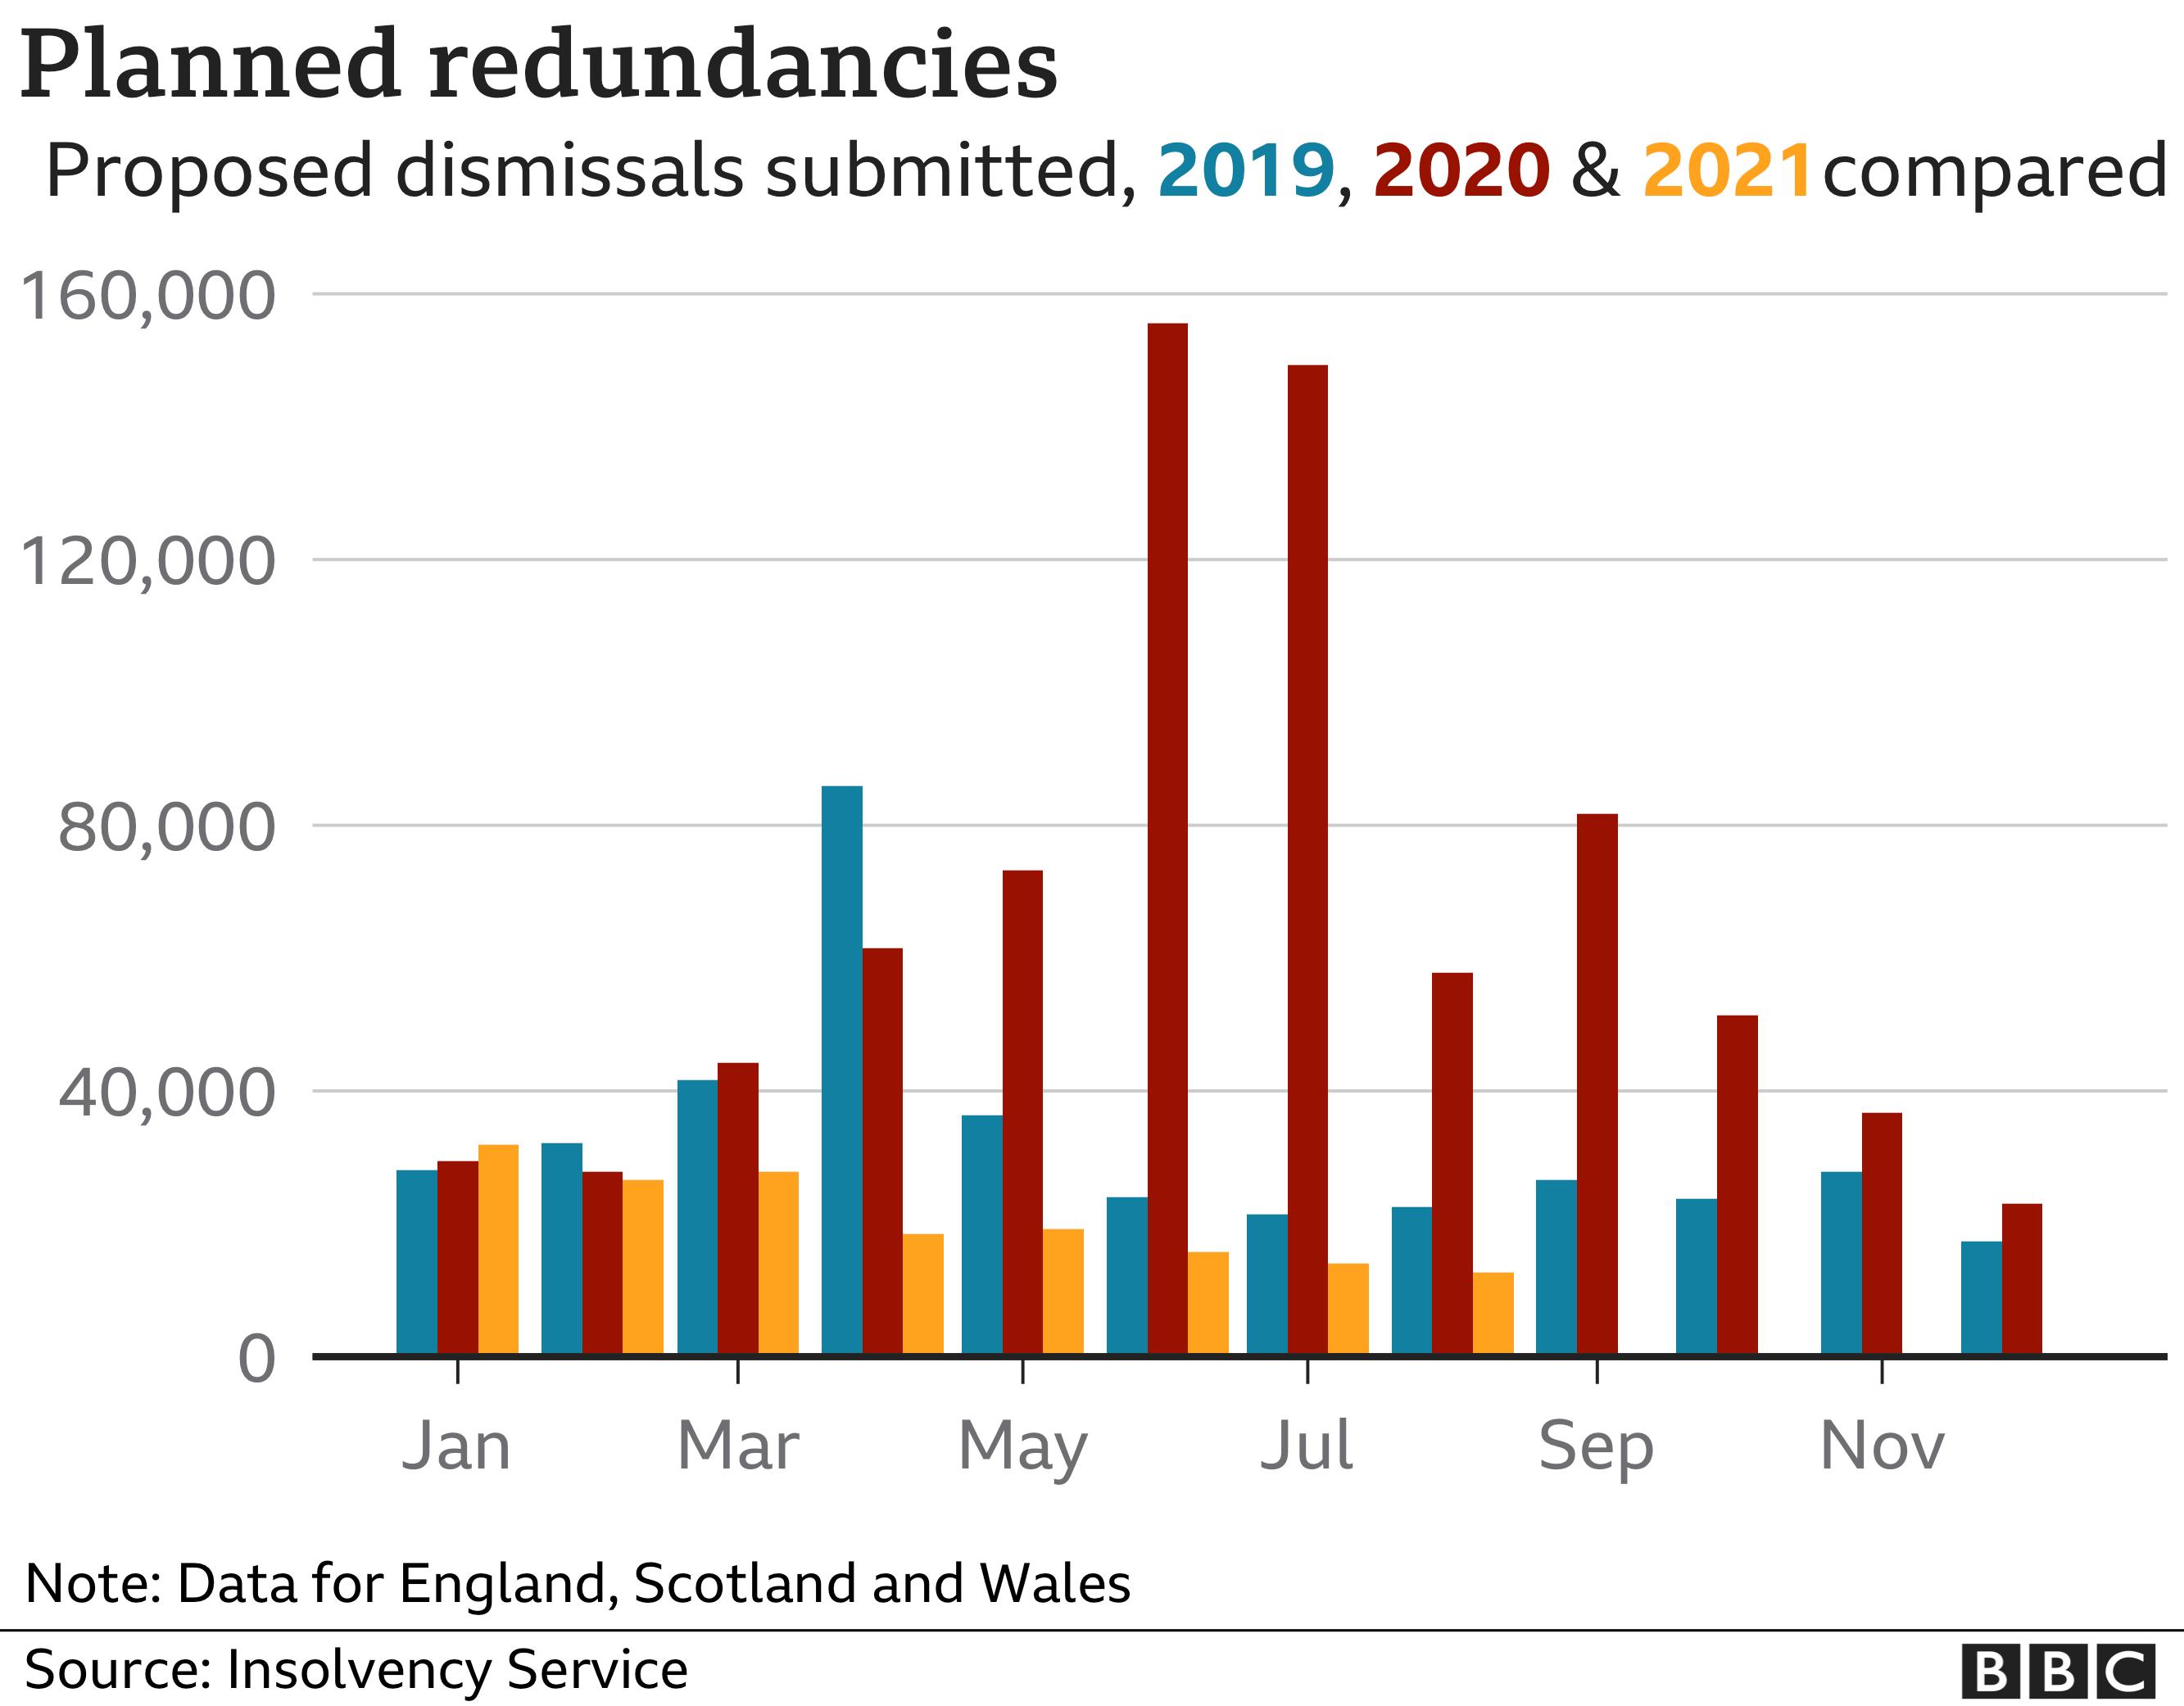 Chart showing planned redundancies